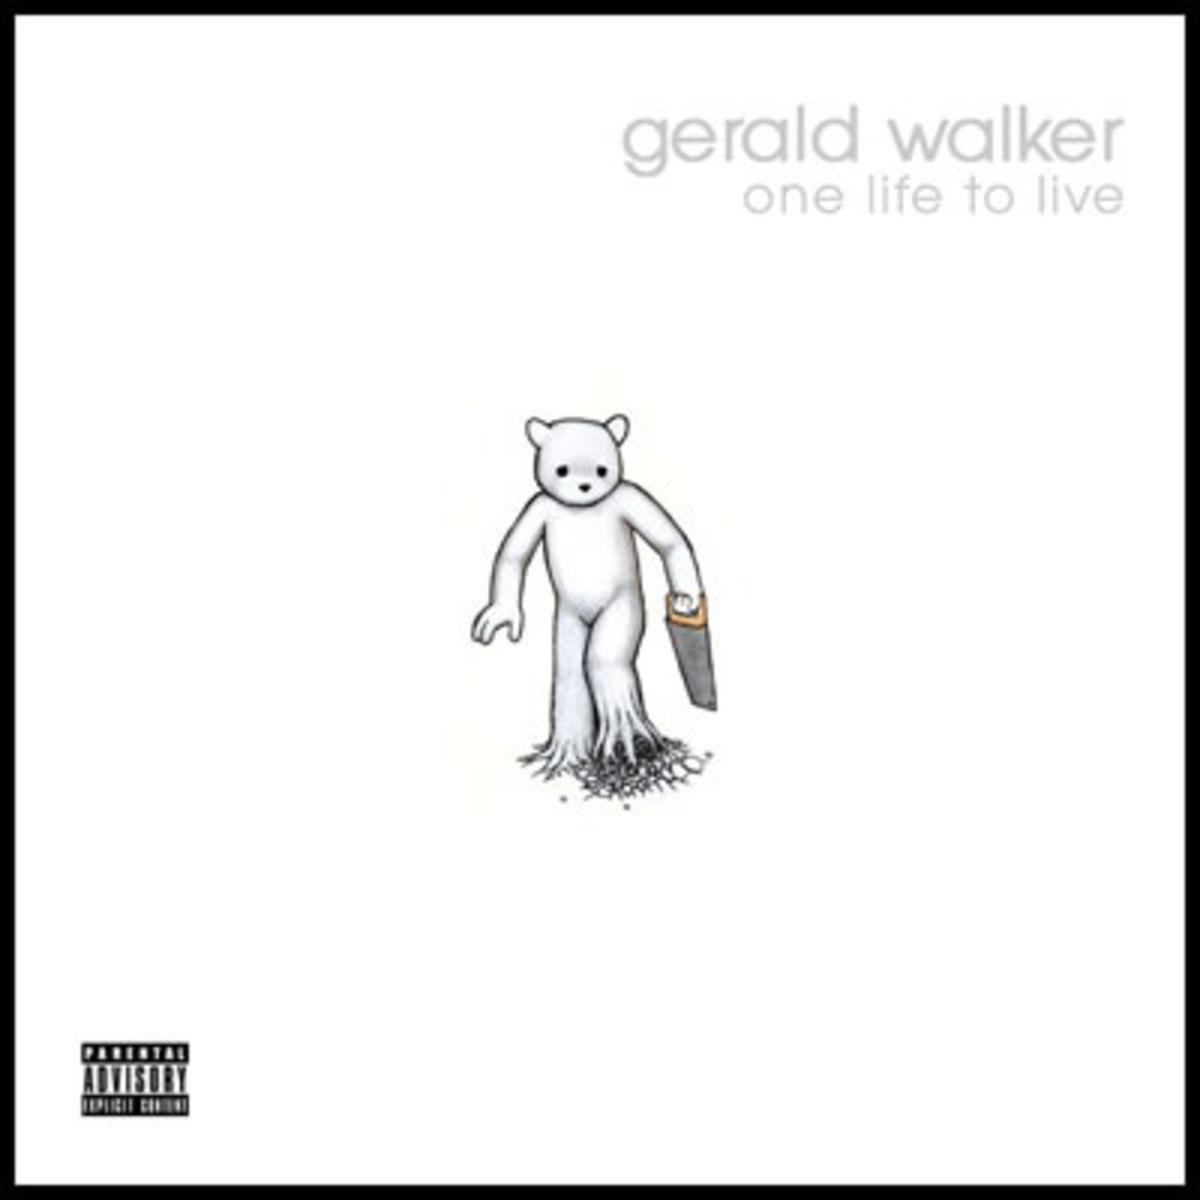 geraldwalker-onelifetolive.jpg